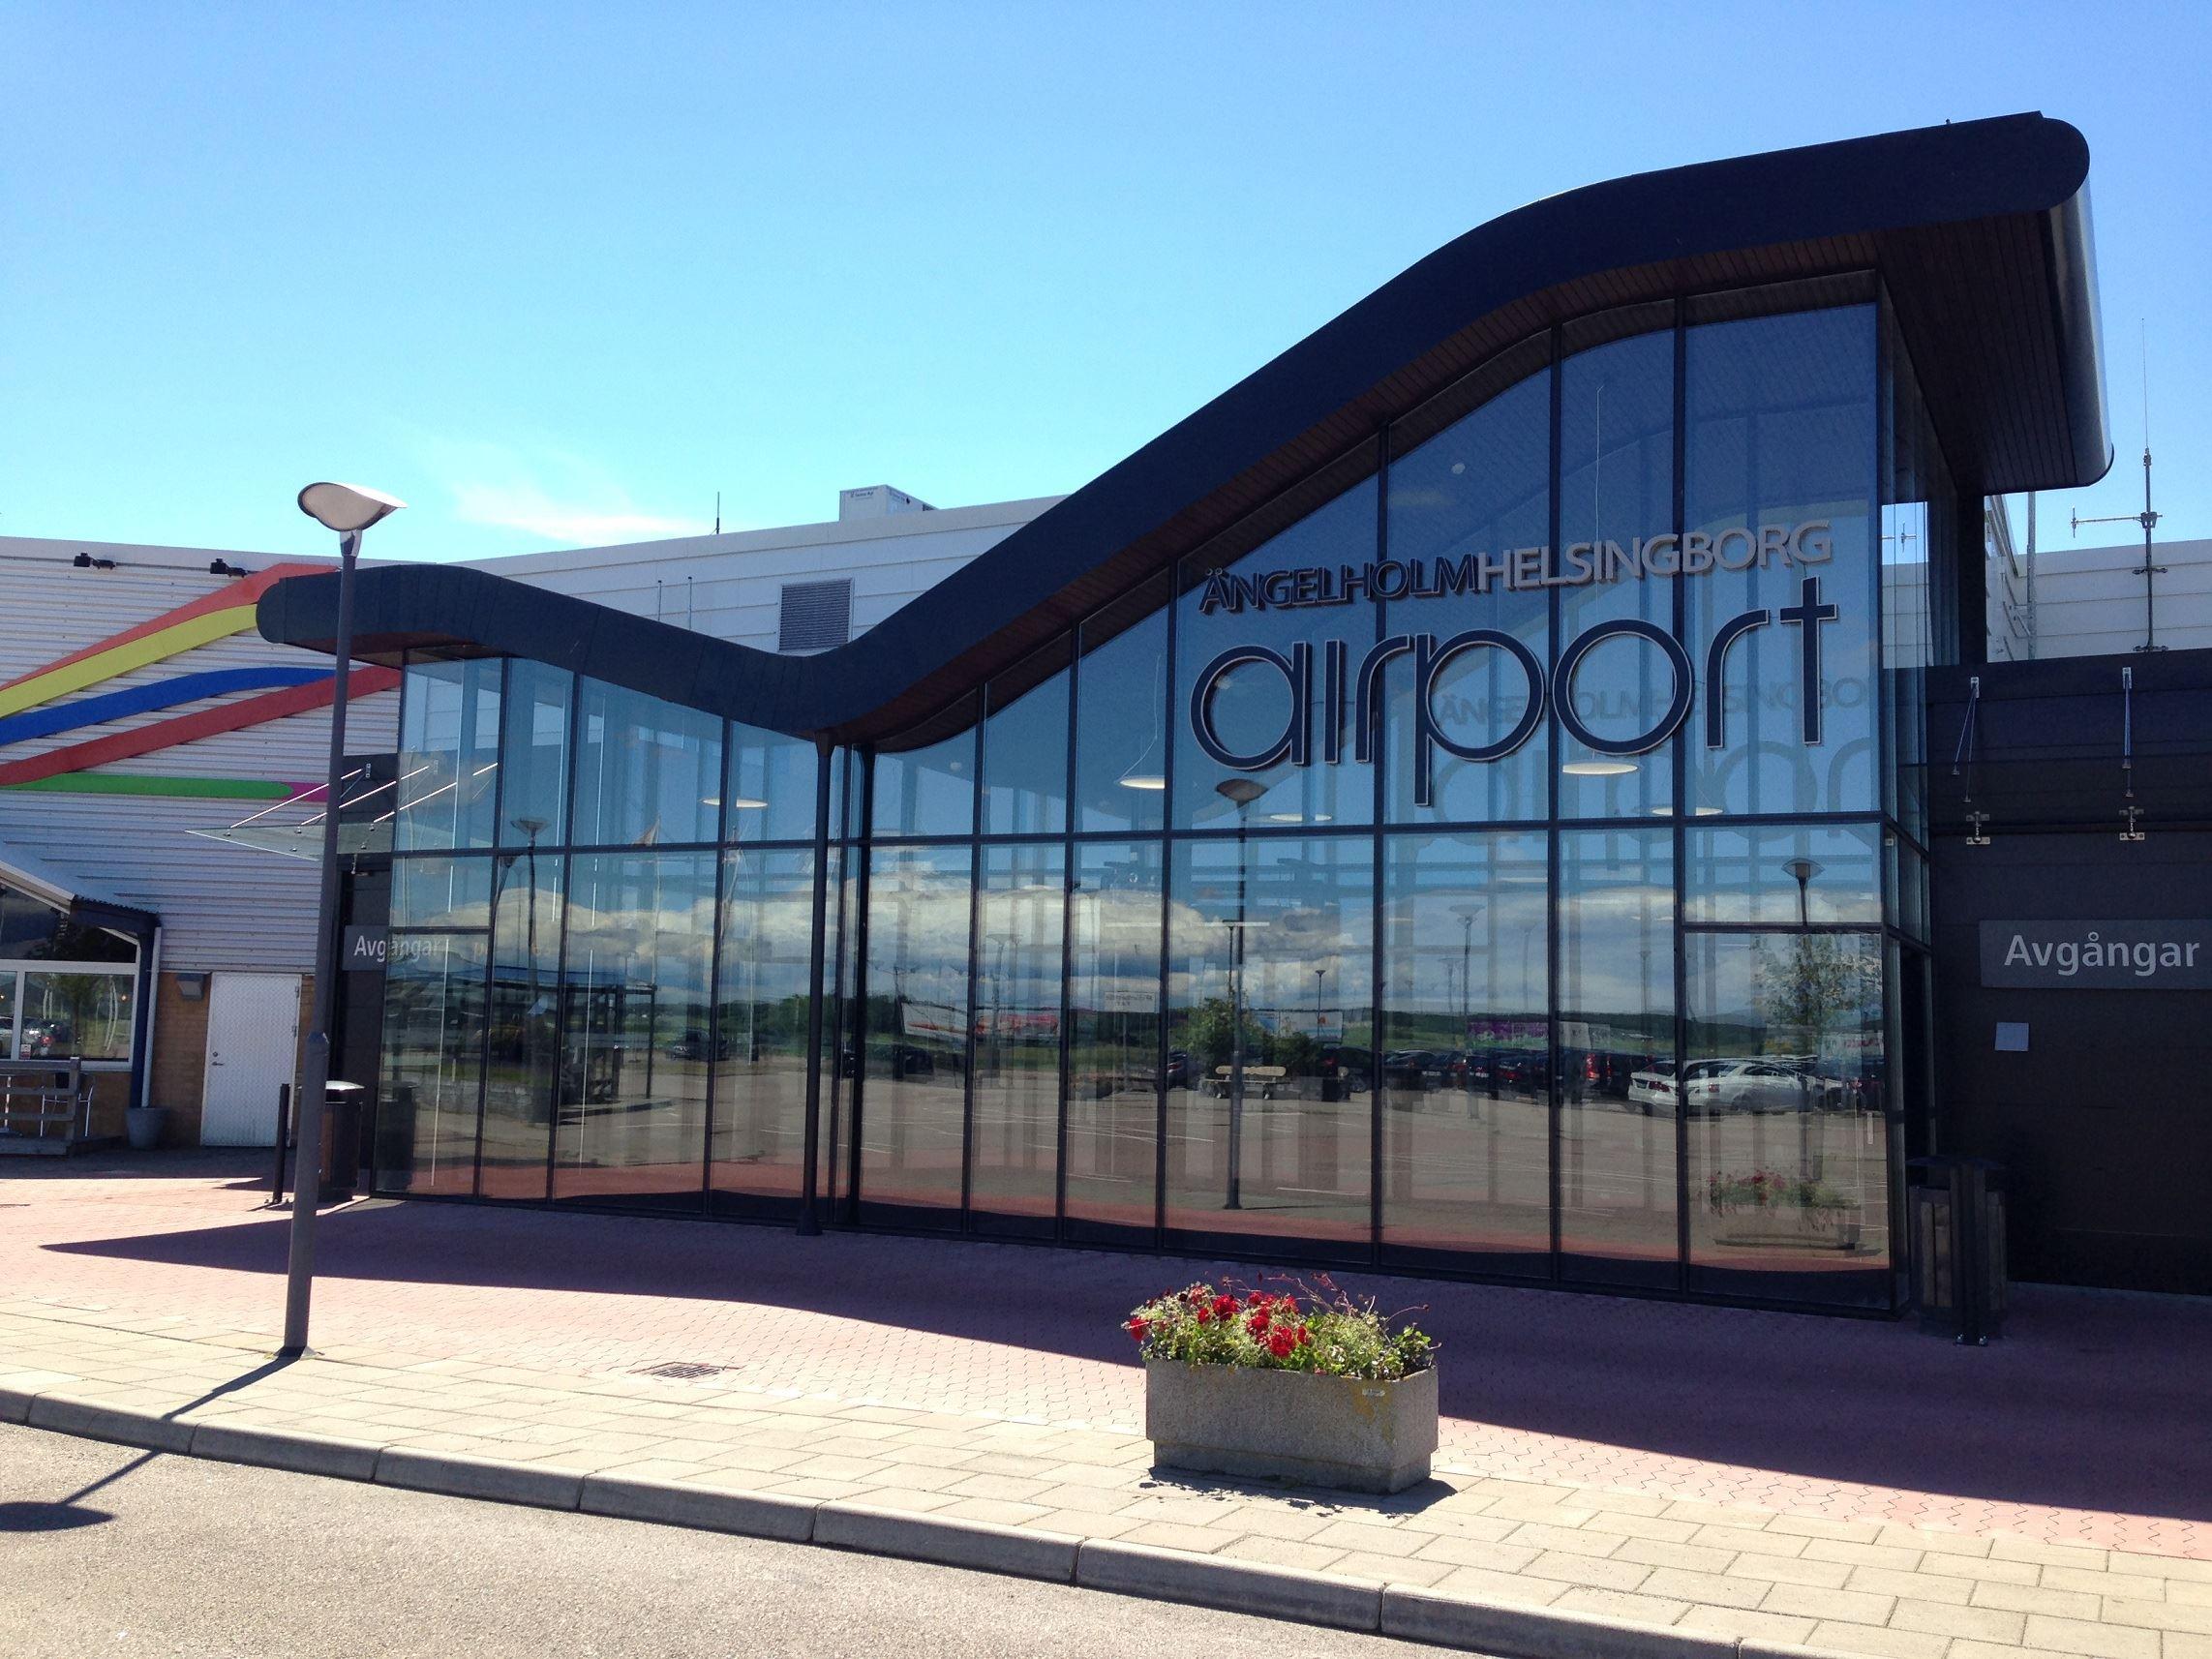 Ängelholm Helsingborg Airport